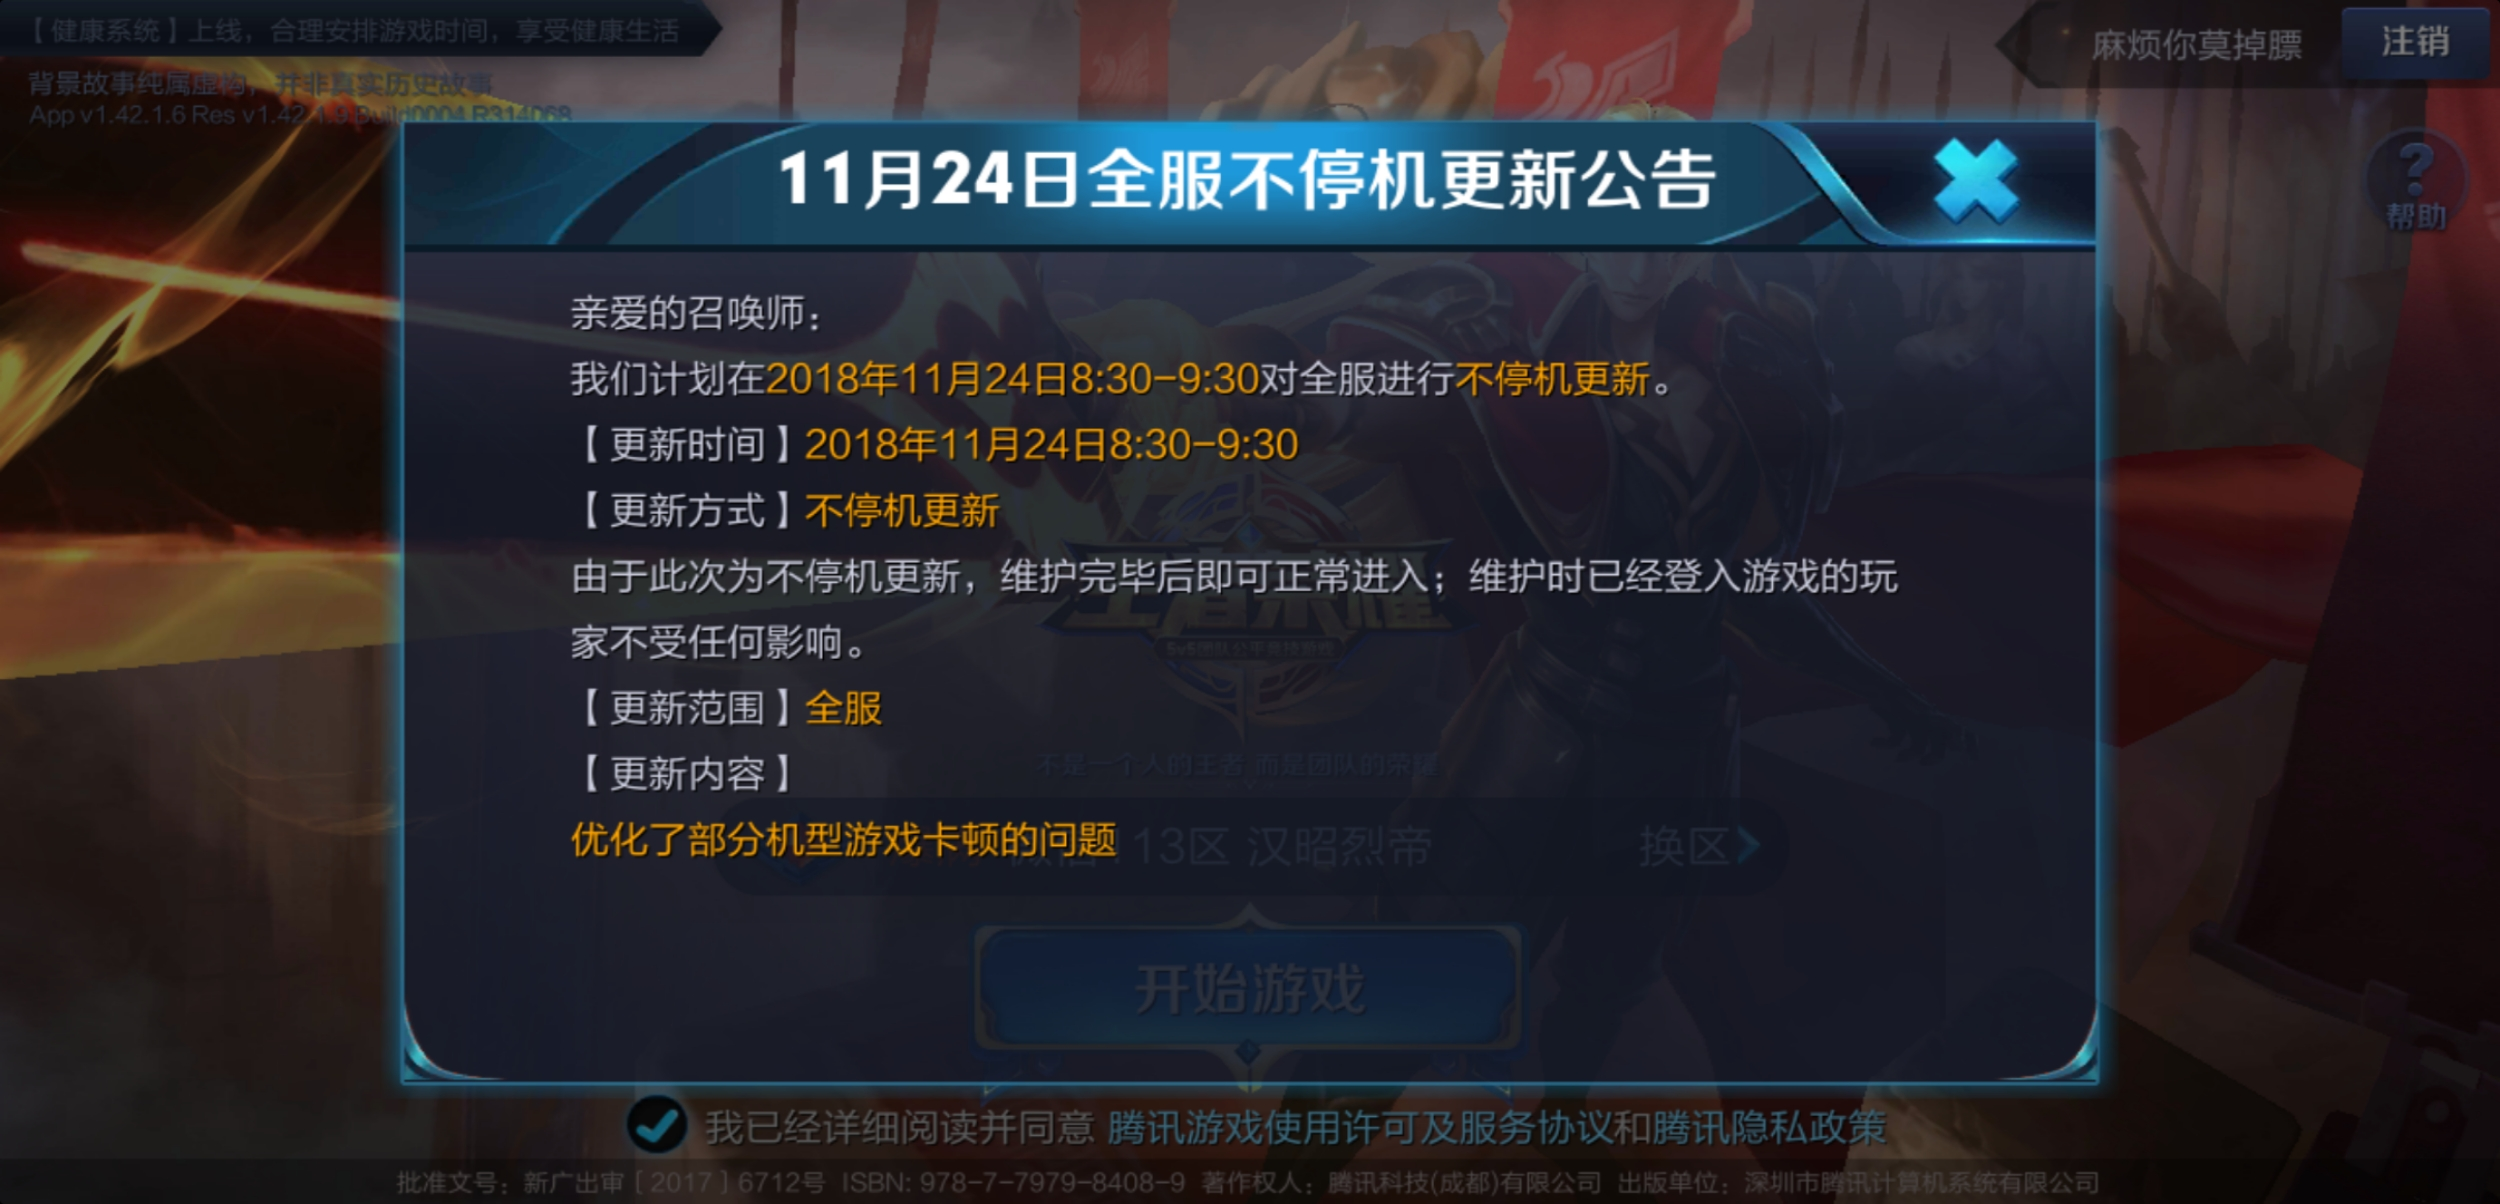 Screenshot_2018-11-24-07-40-49-903.png